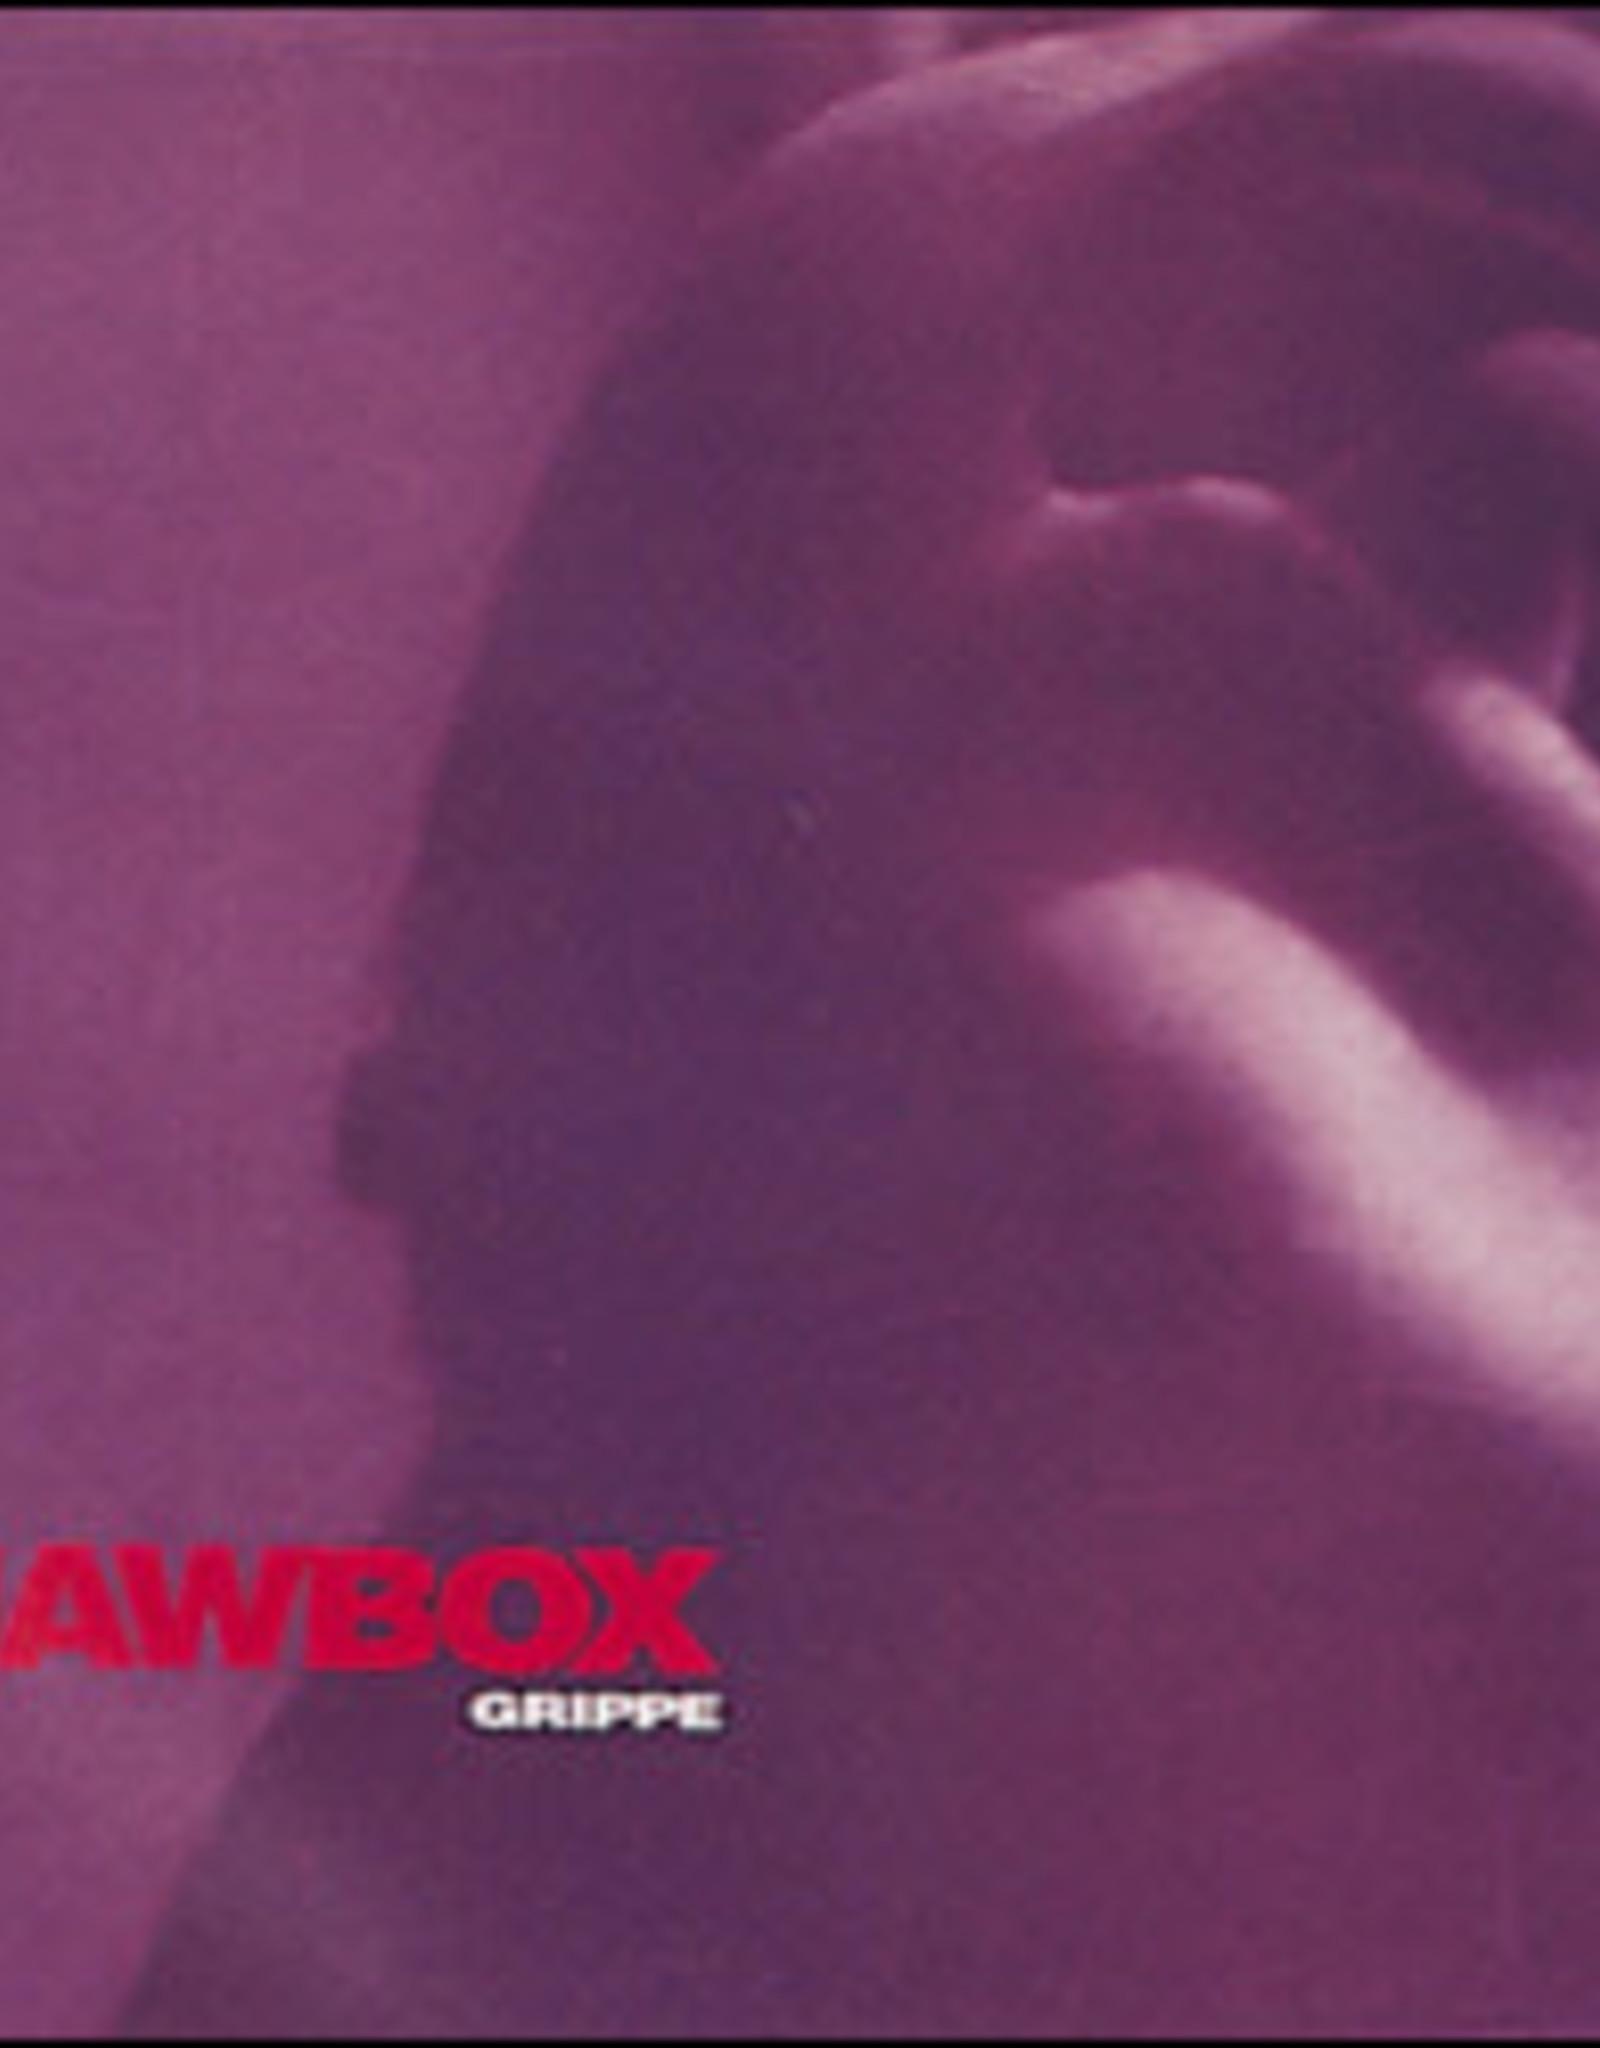 Jawbox - Grippe